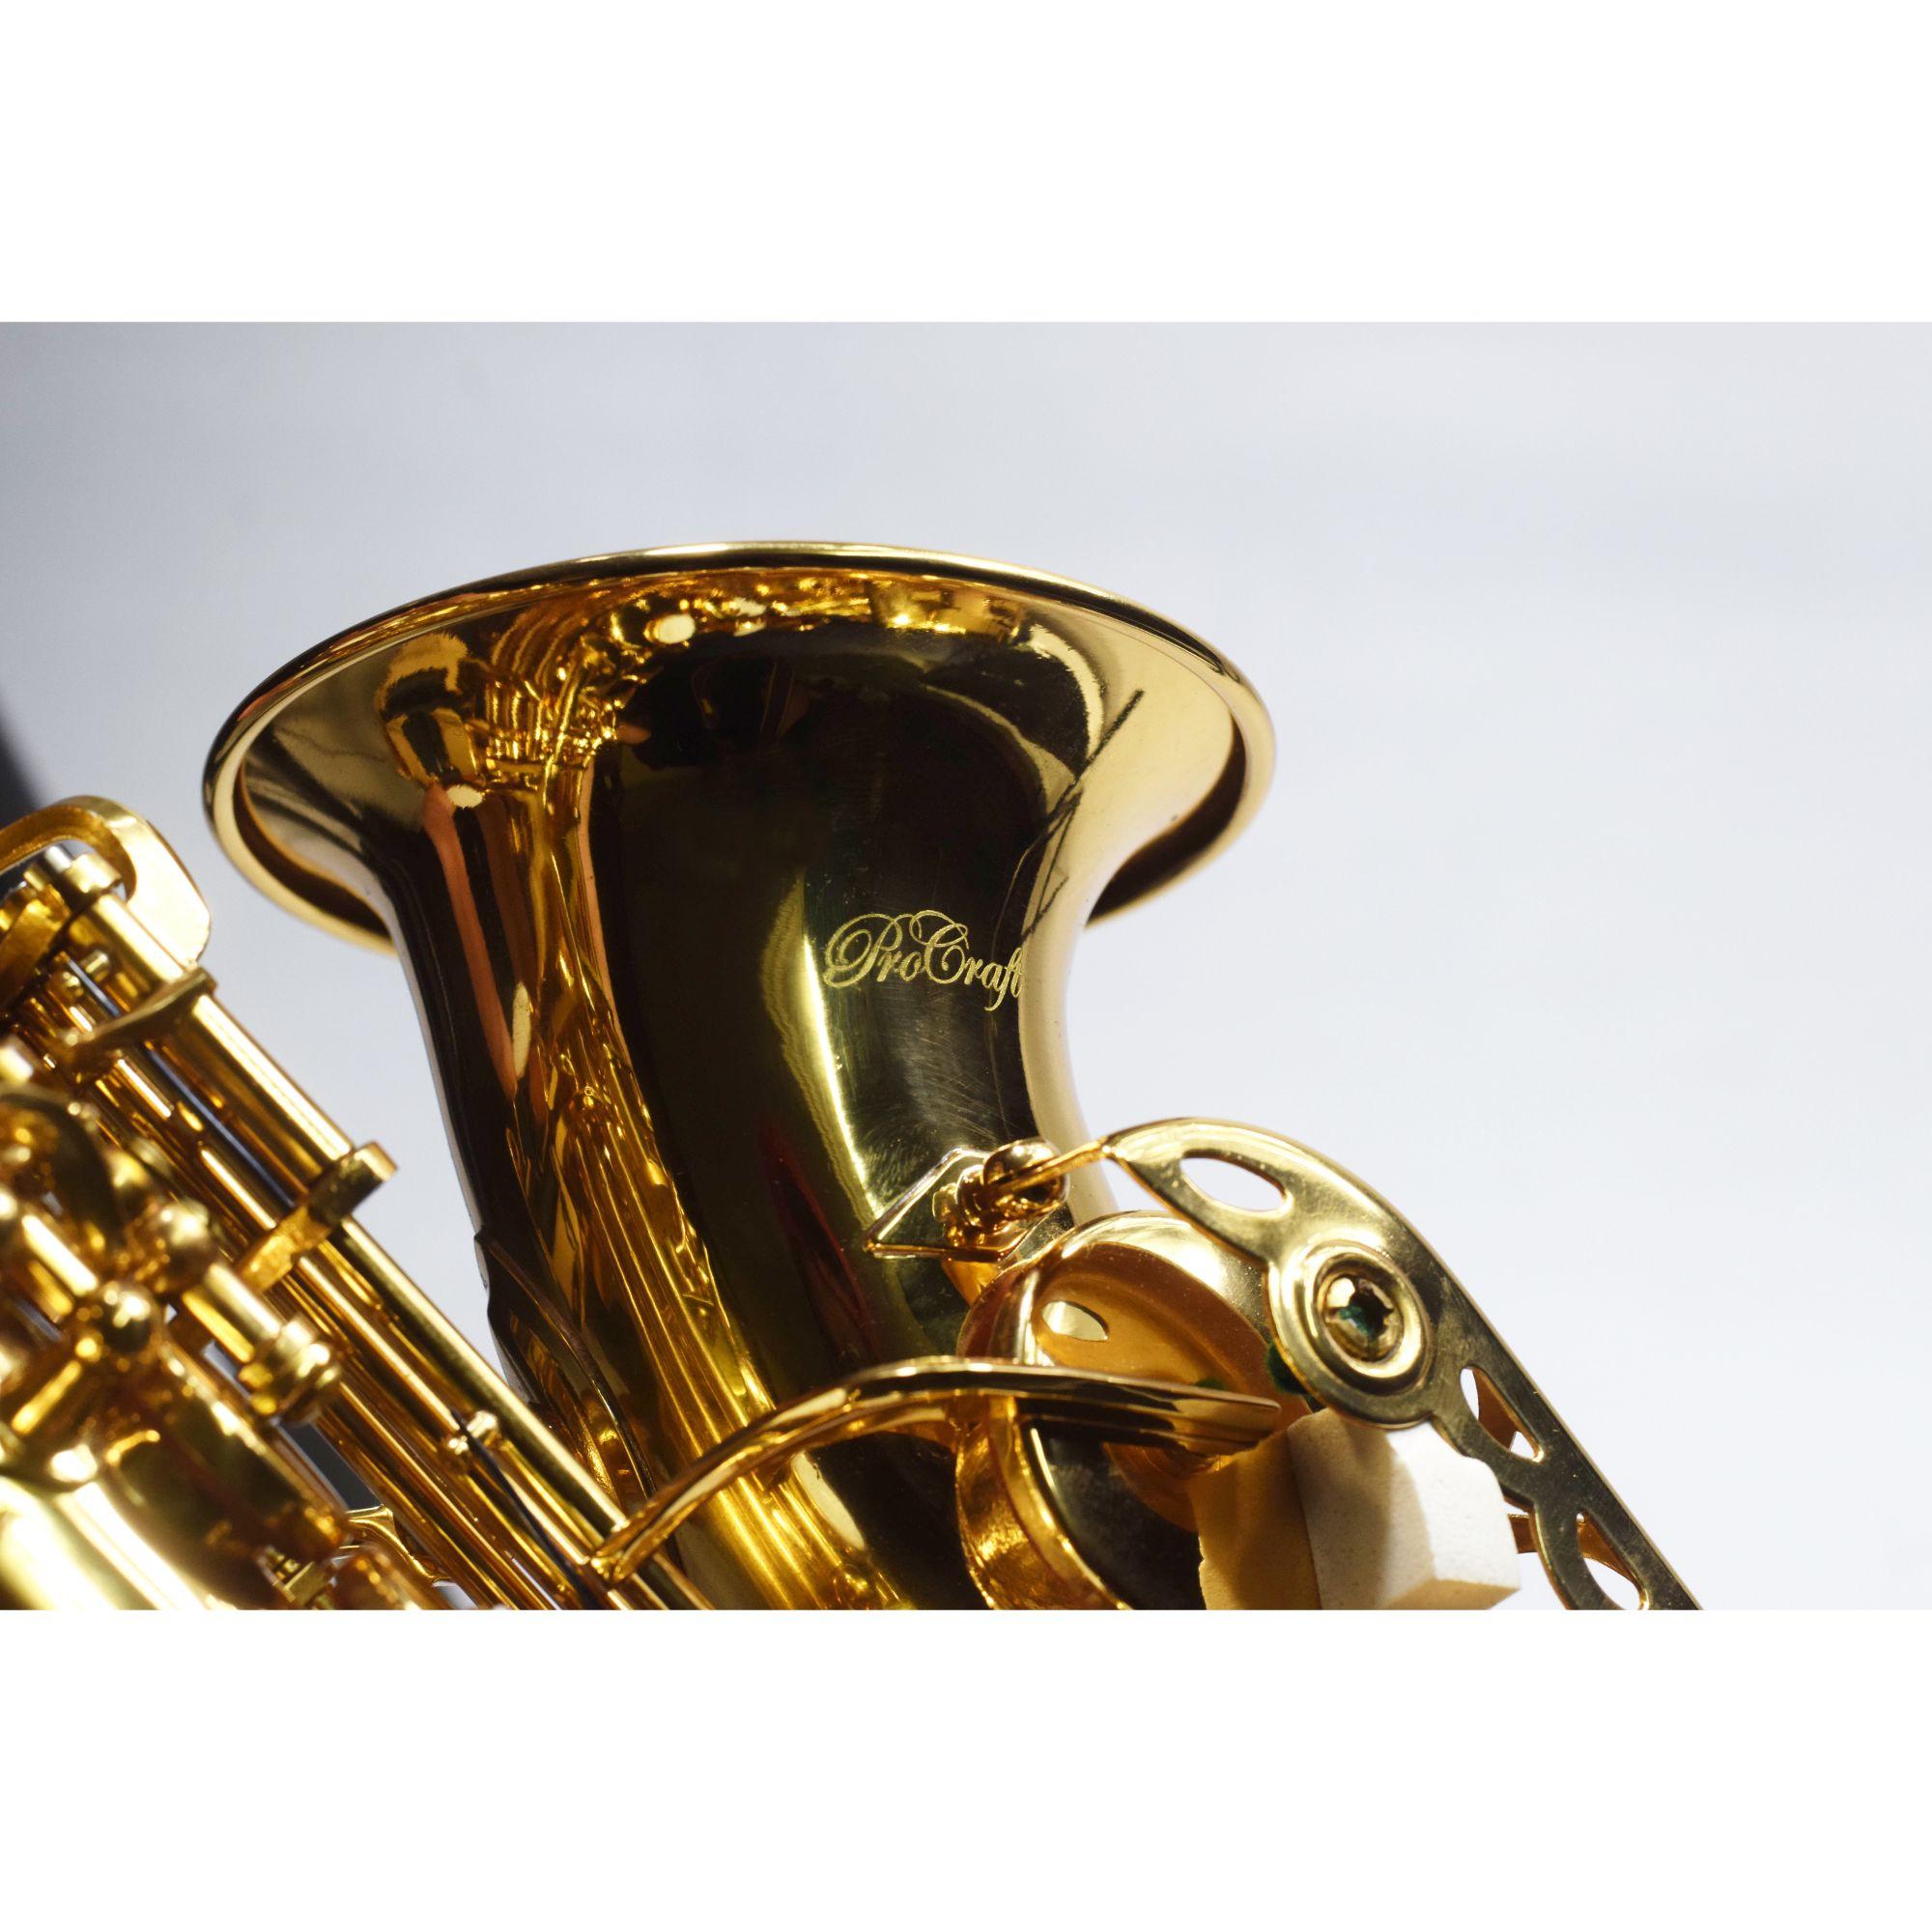 Procraft curved soprano saxophone PRSSC 310GL